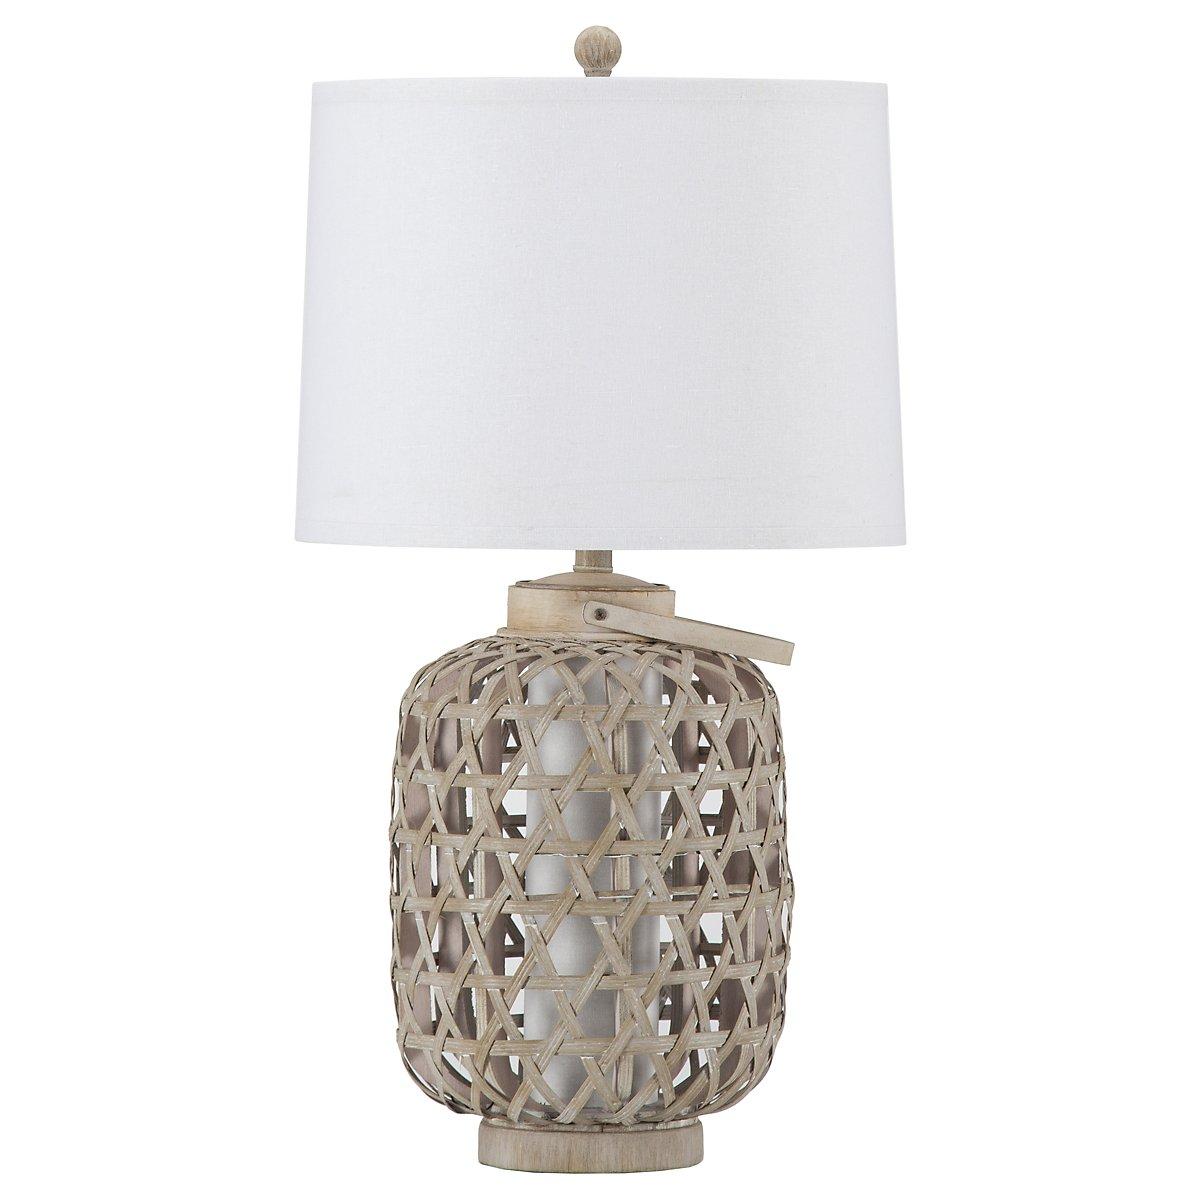 Basket Light Beige Table Lamp